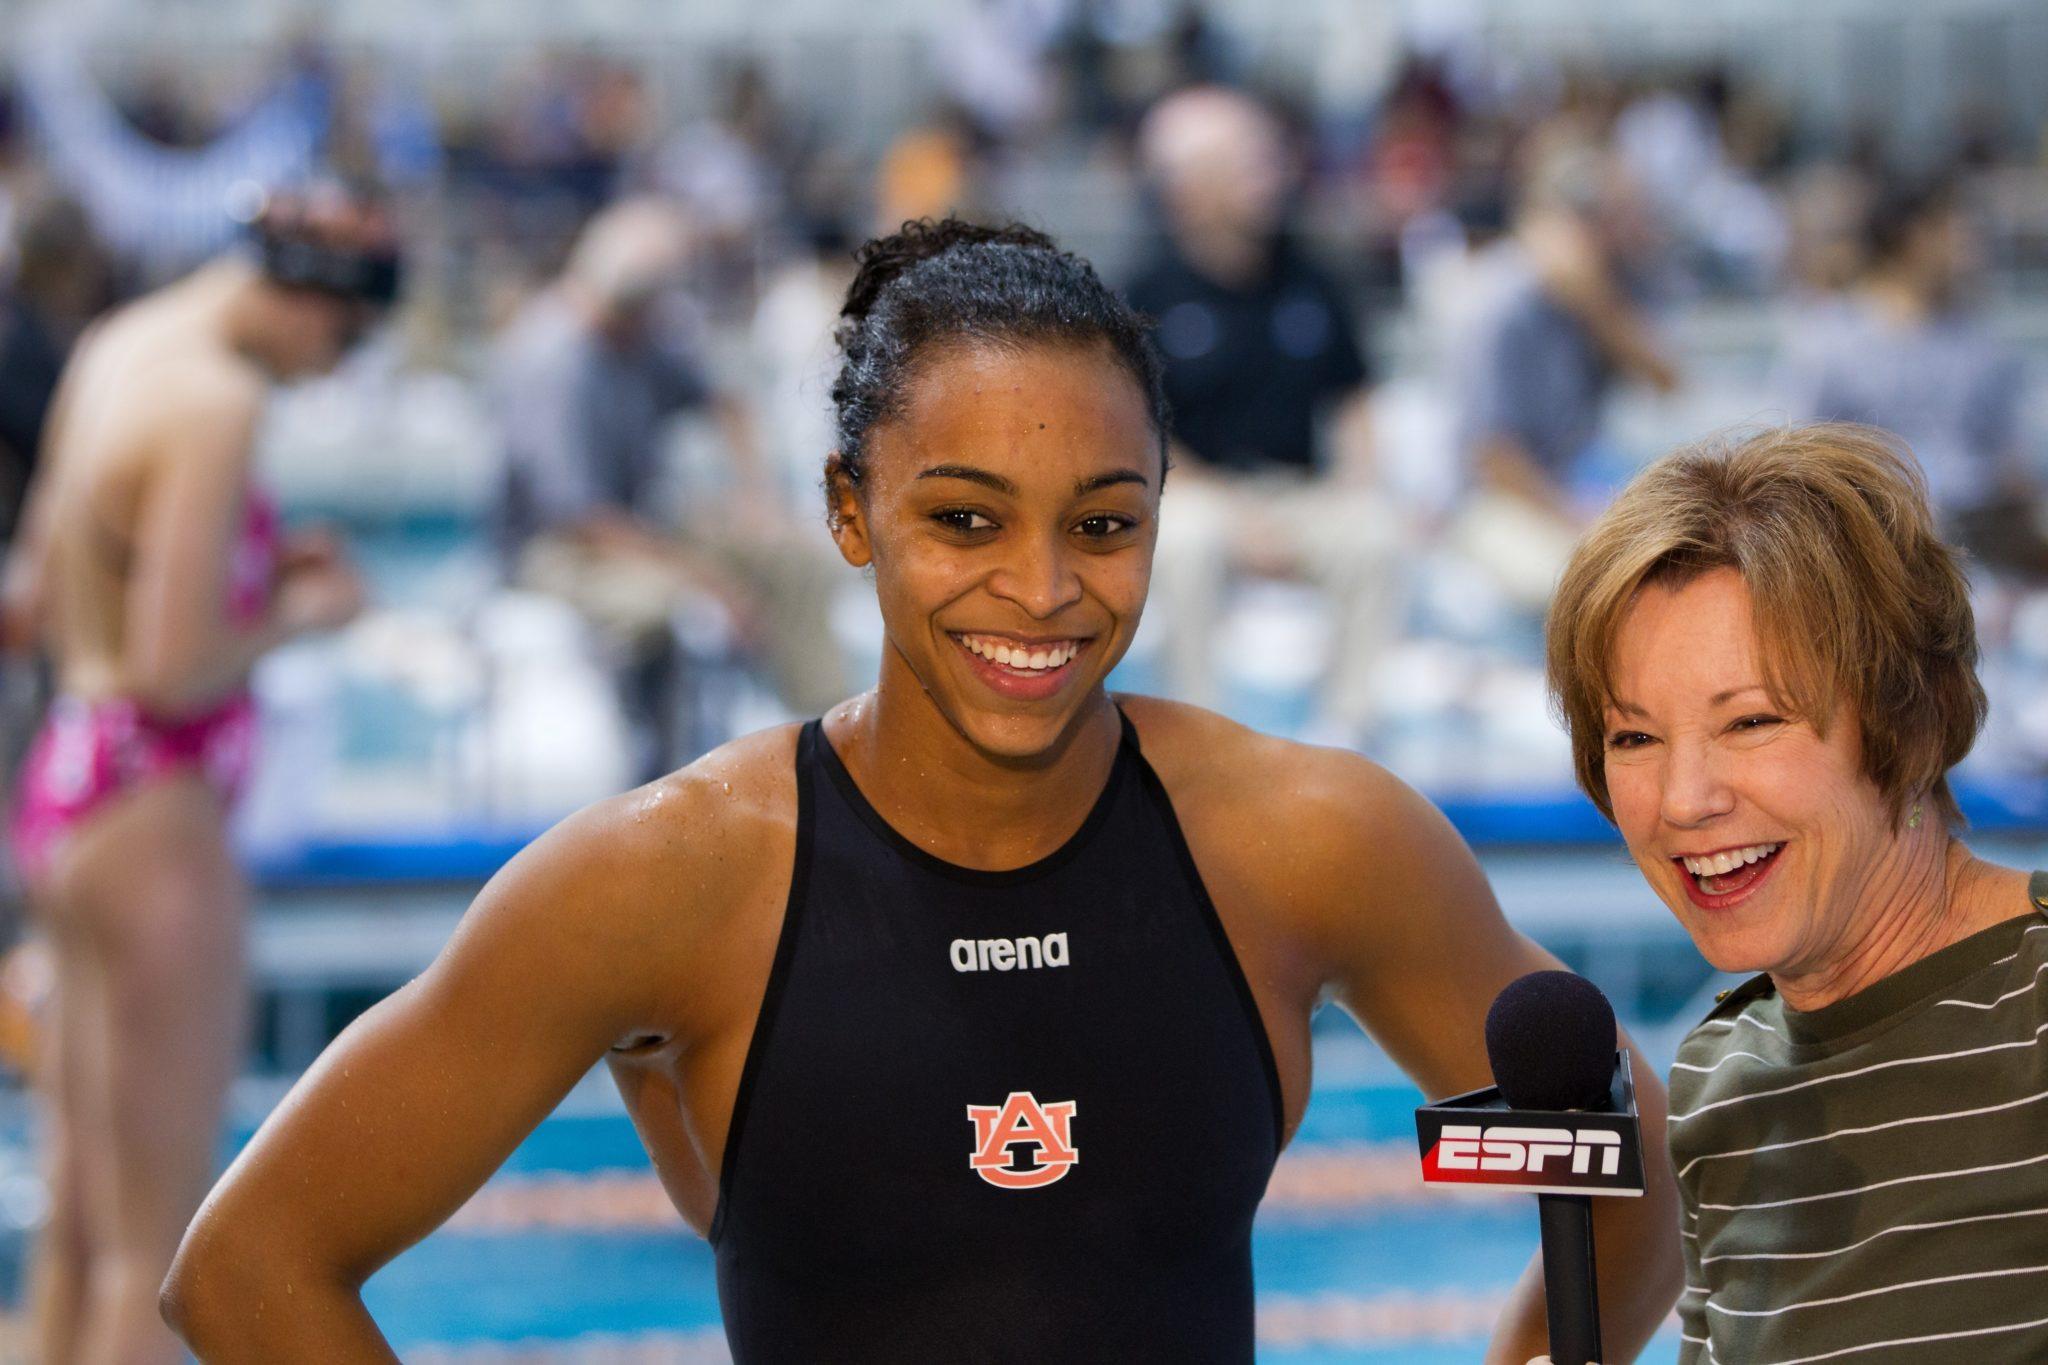 SwimMAC Carolina Gets Three More NCAA Stars for Its TeamElite